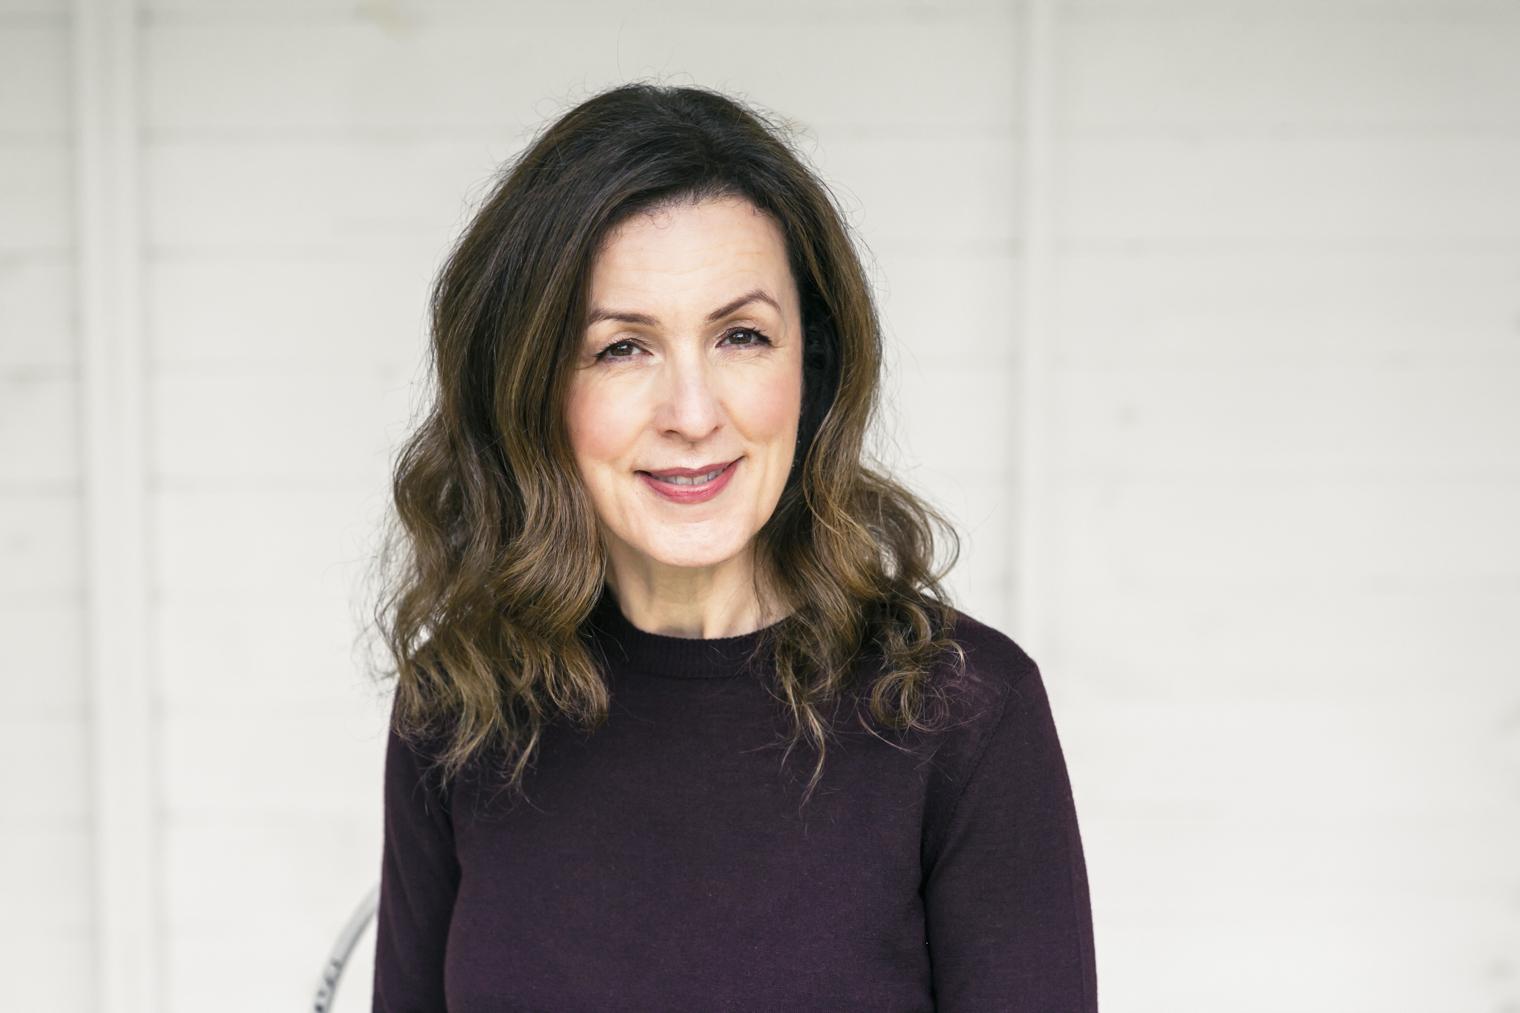 Professional Headshot Tips Rona Wheeldon Flowerona